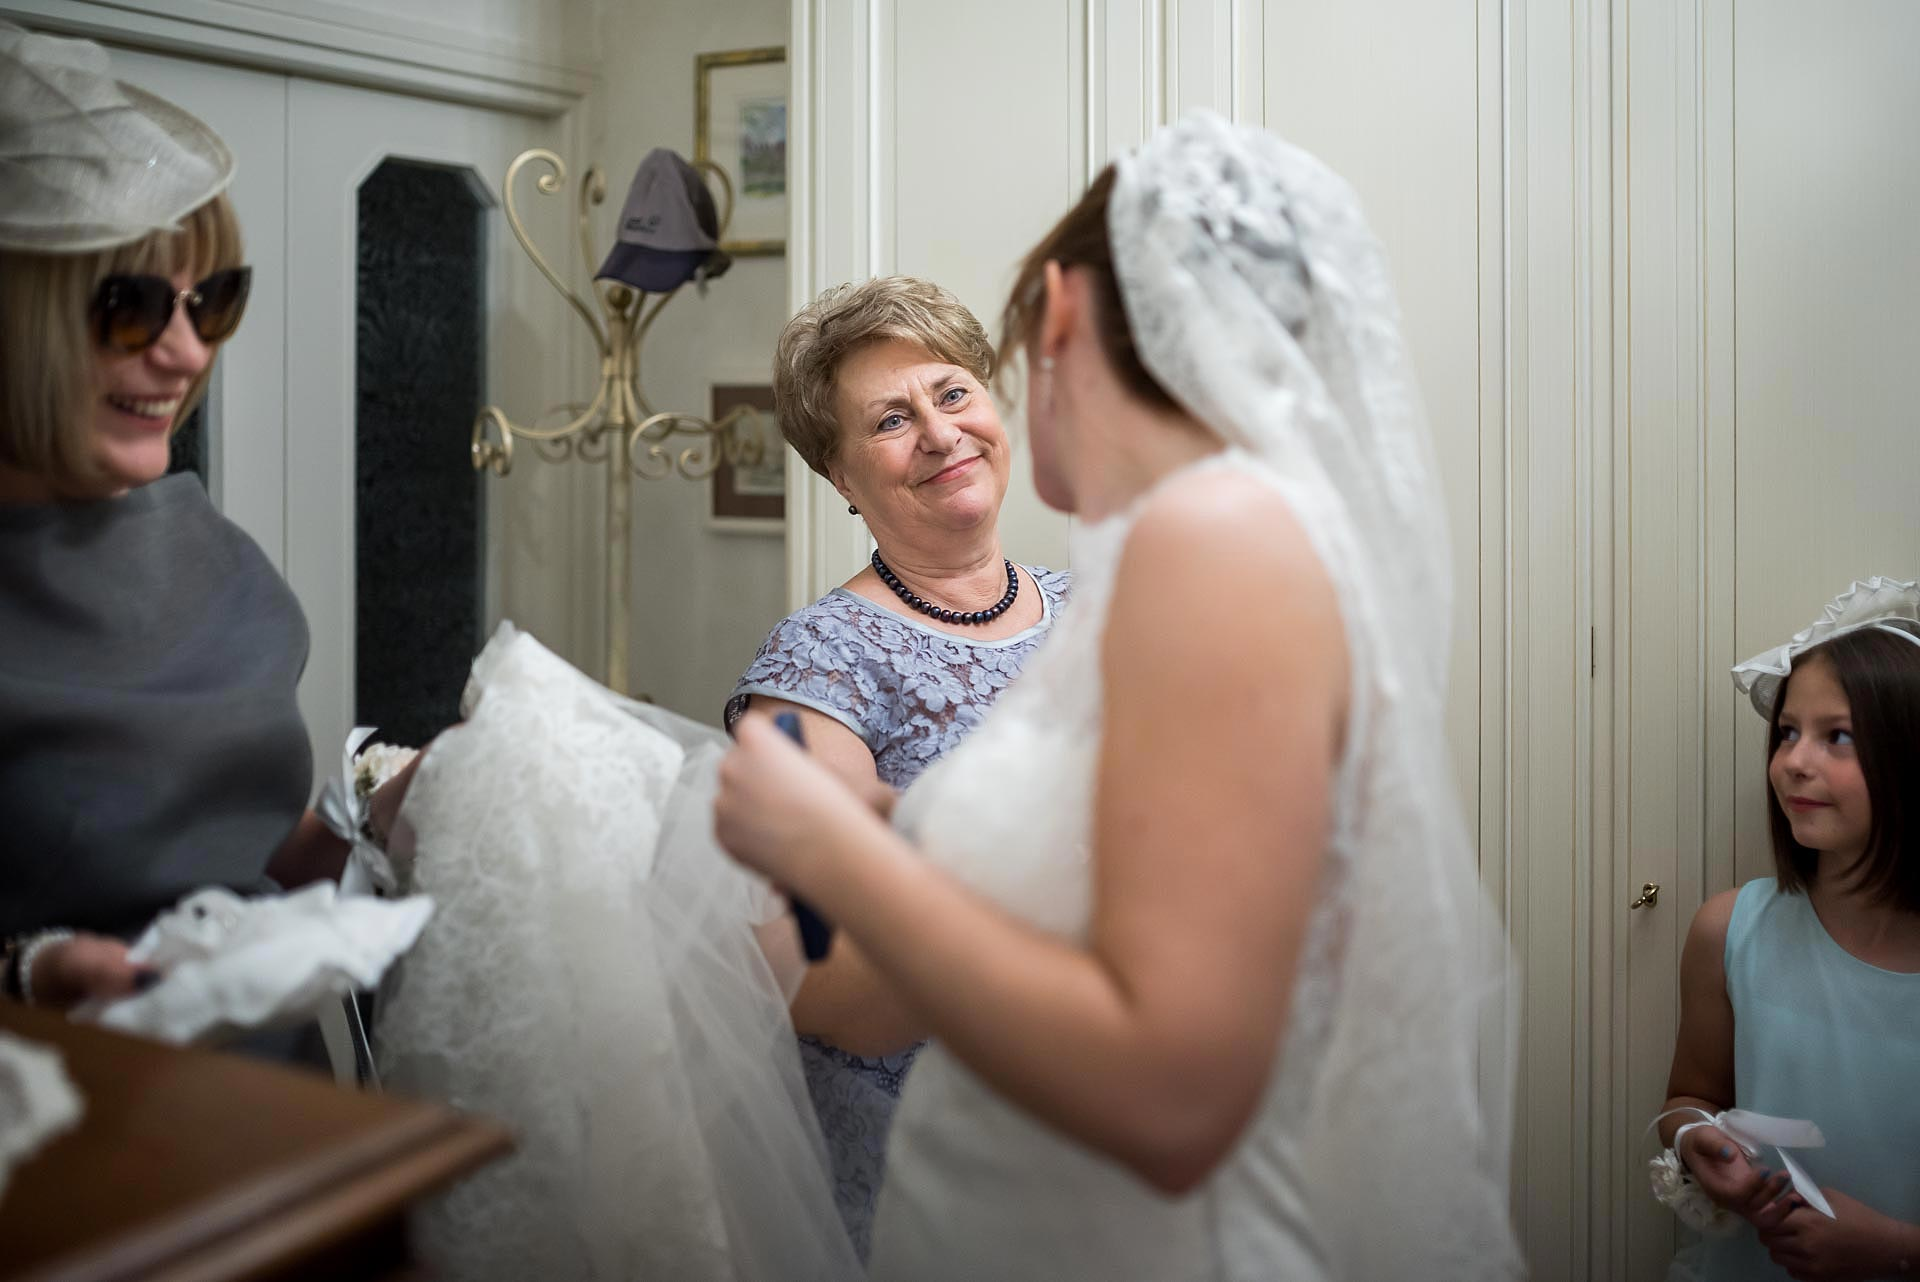 foto-preparativi-sposa-matrimonio-roma-24